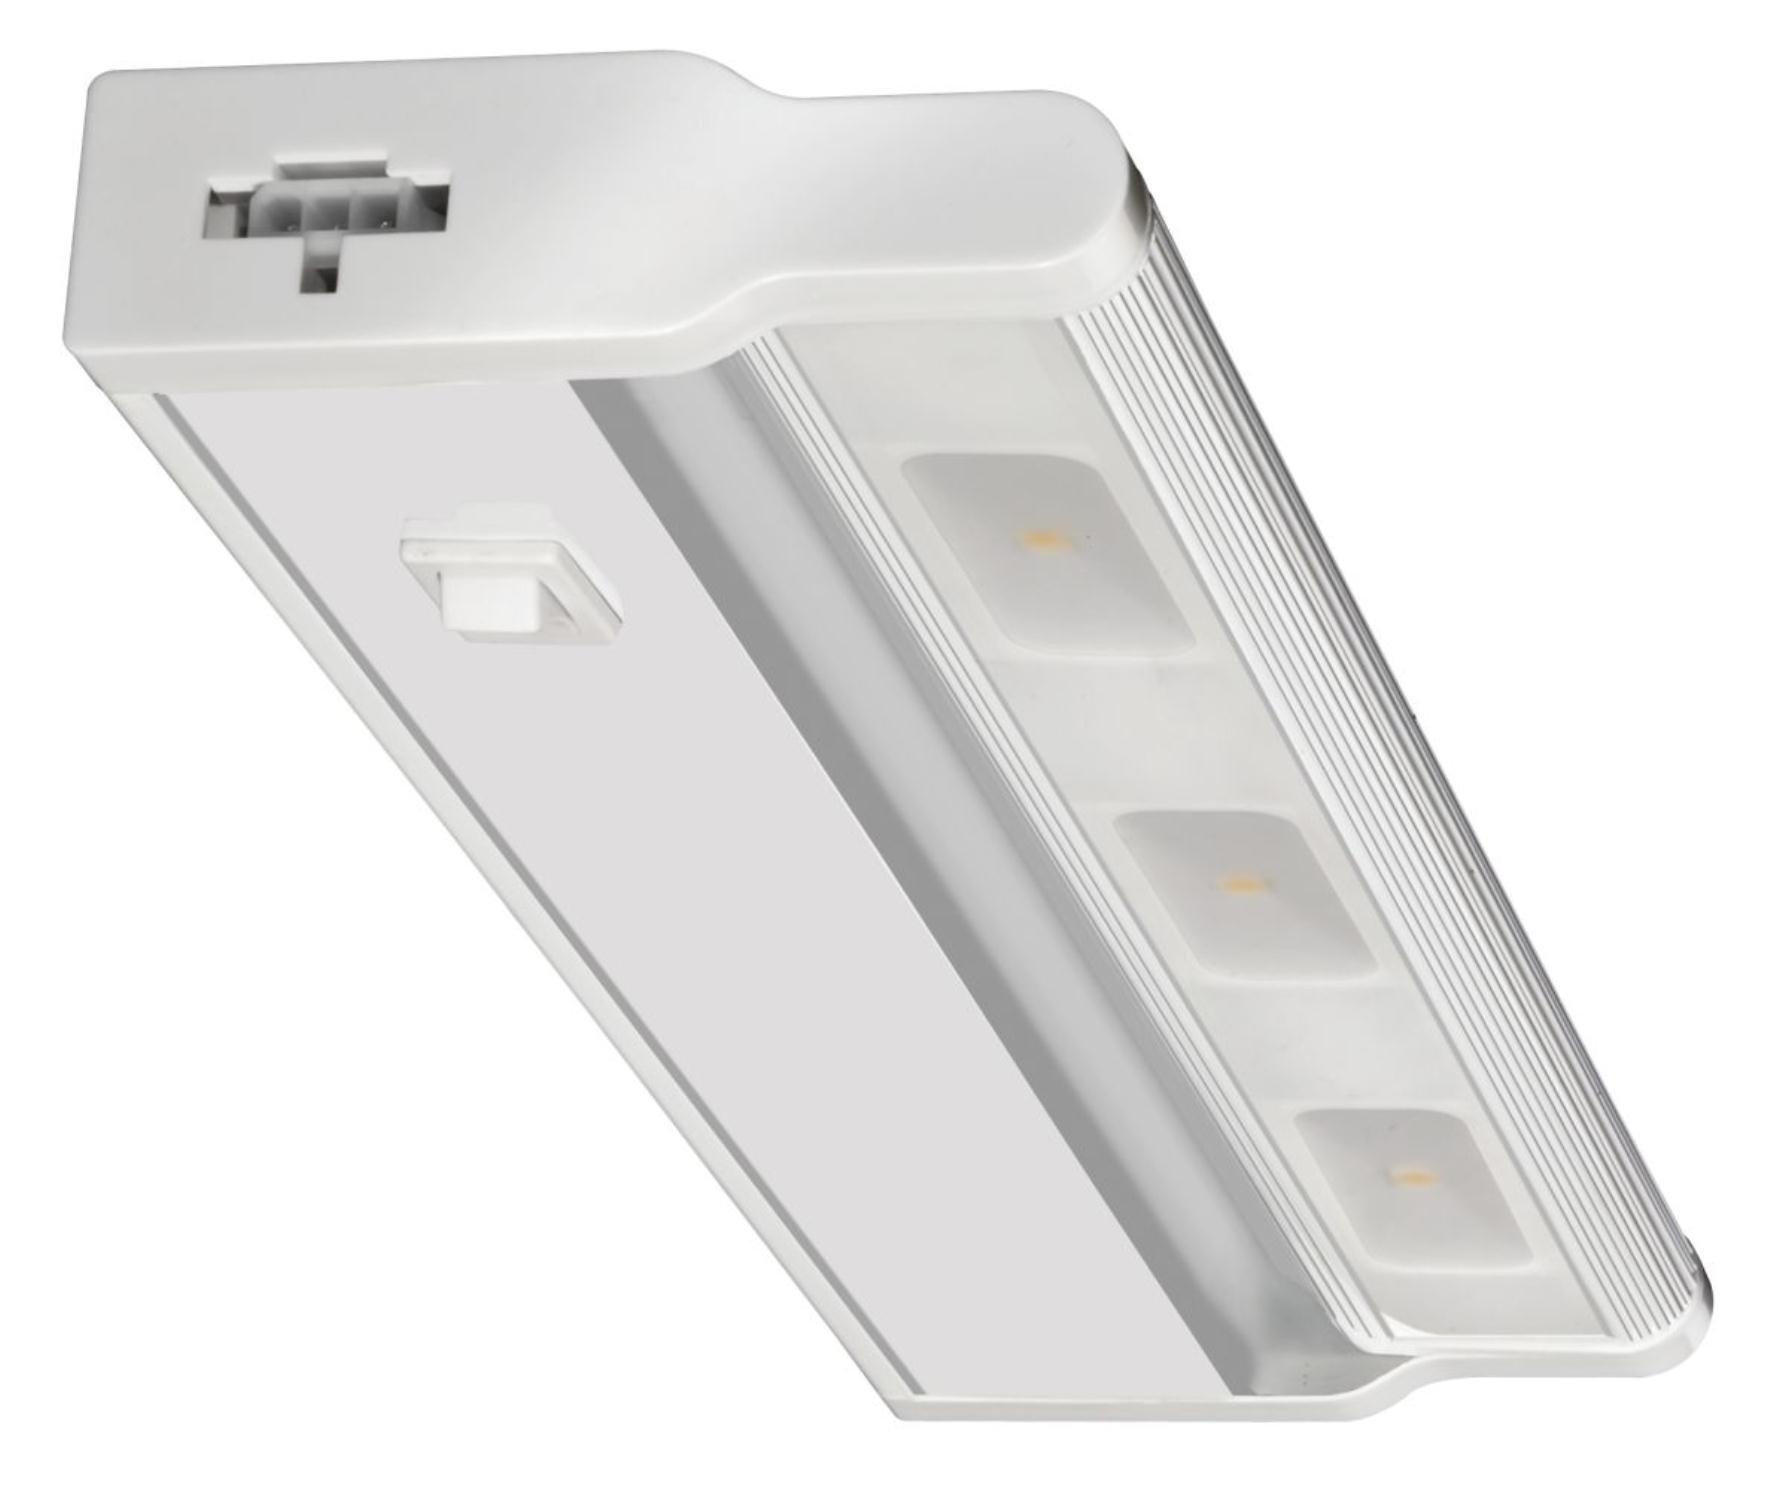 Lithonia Lighting UCLD 12 2700 WH M4 Under Cabinet LED Light, 3000K, 12.5 Watt, 24-Inch, White